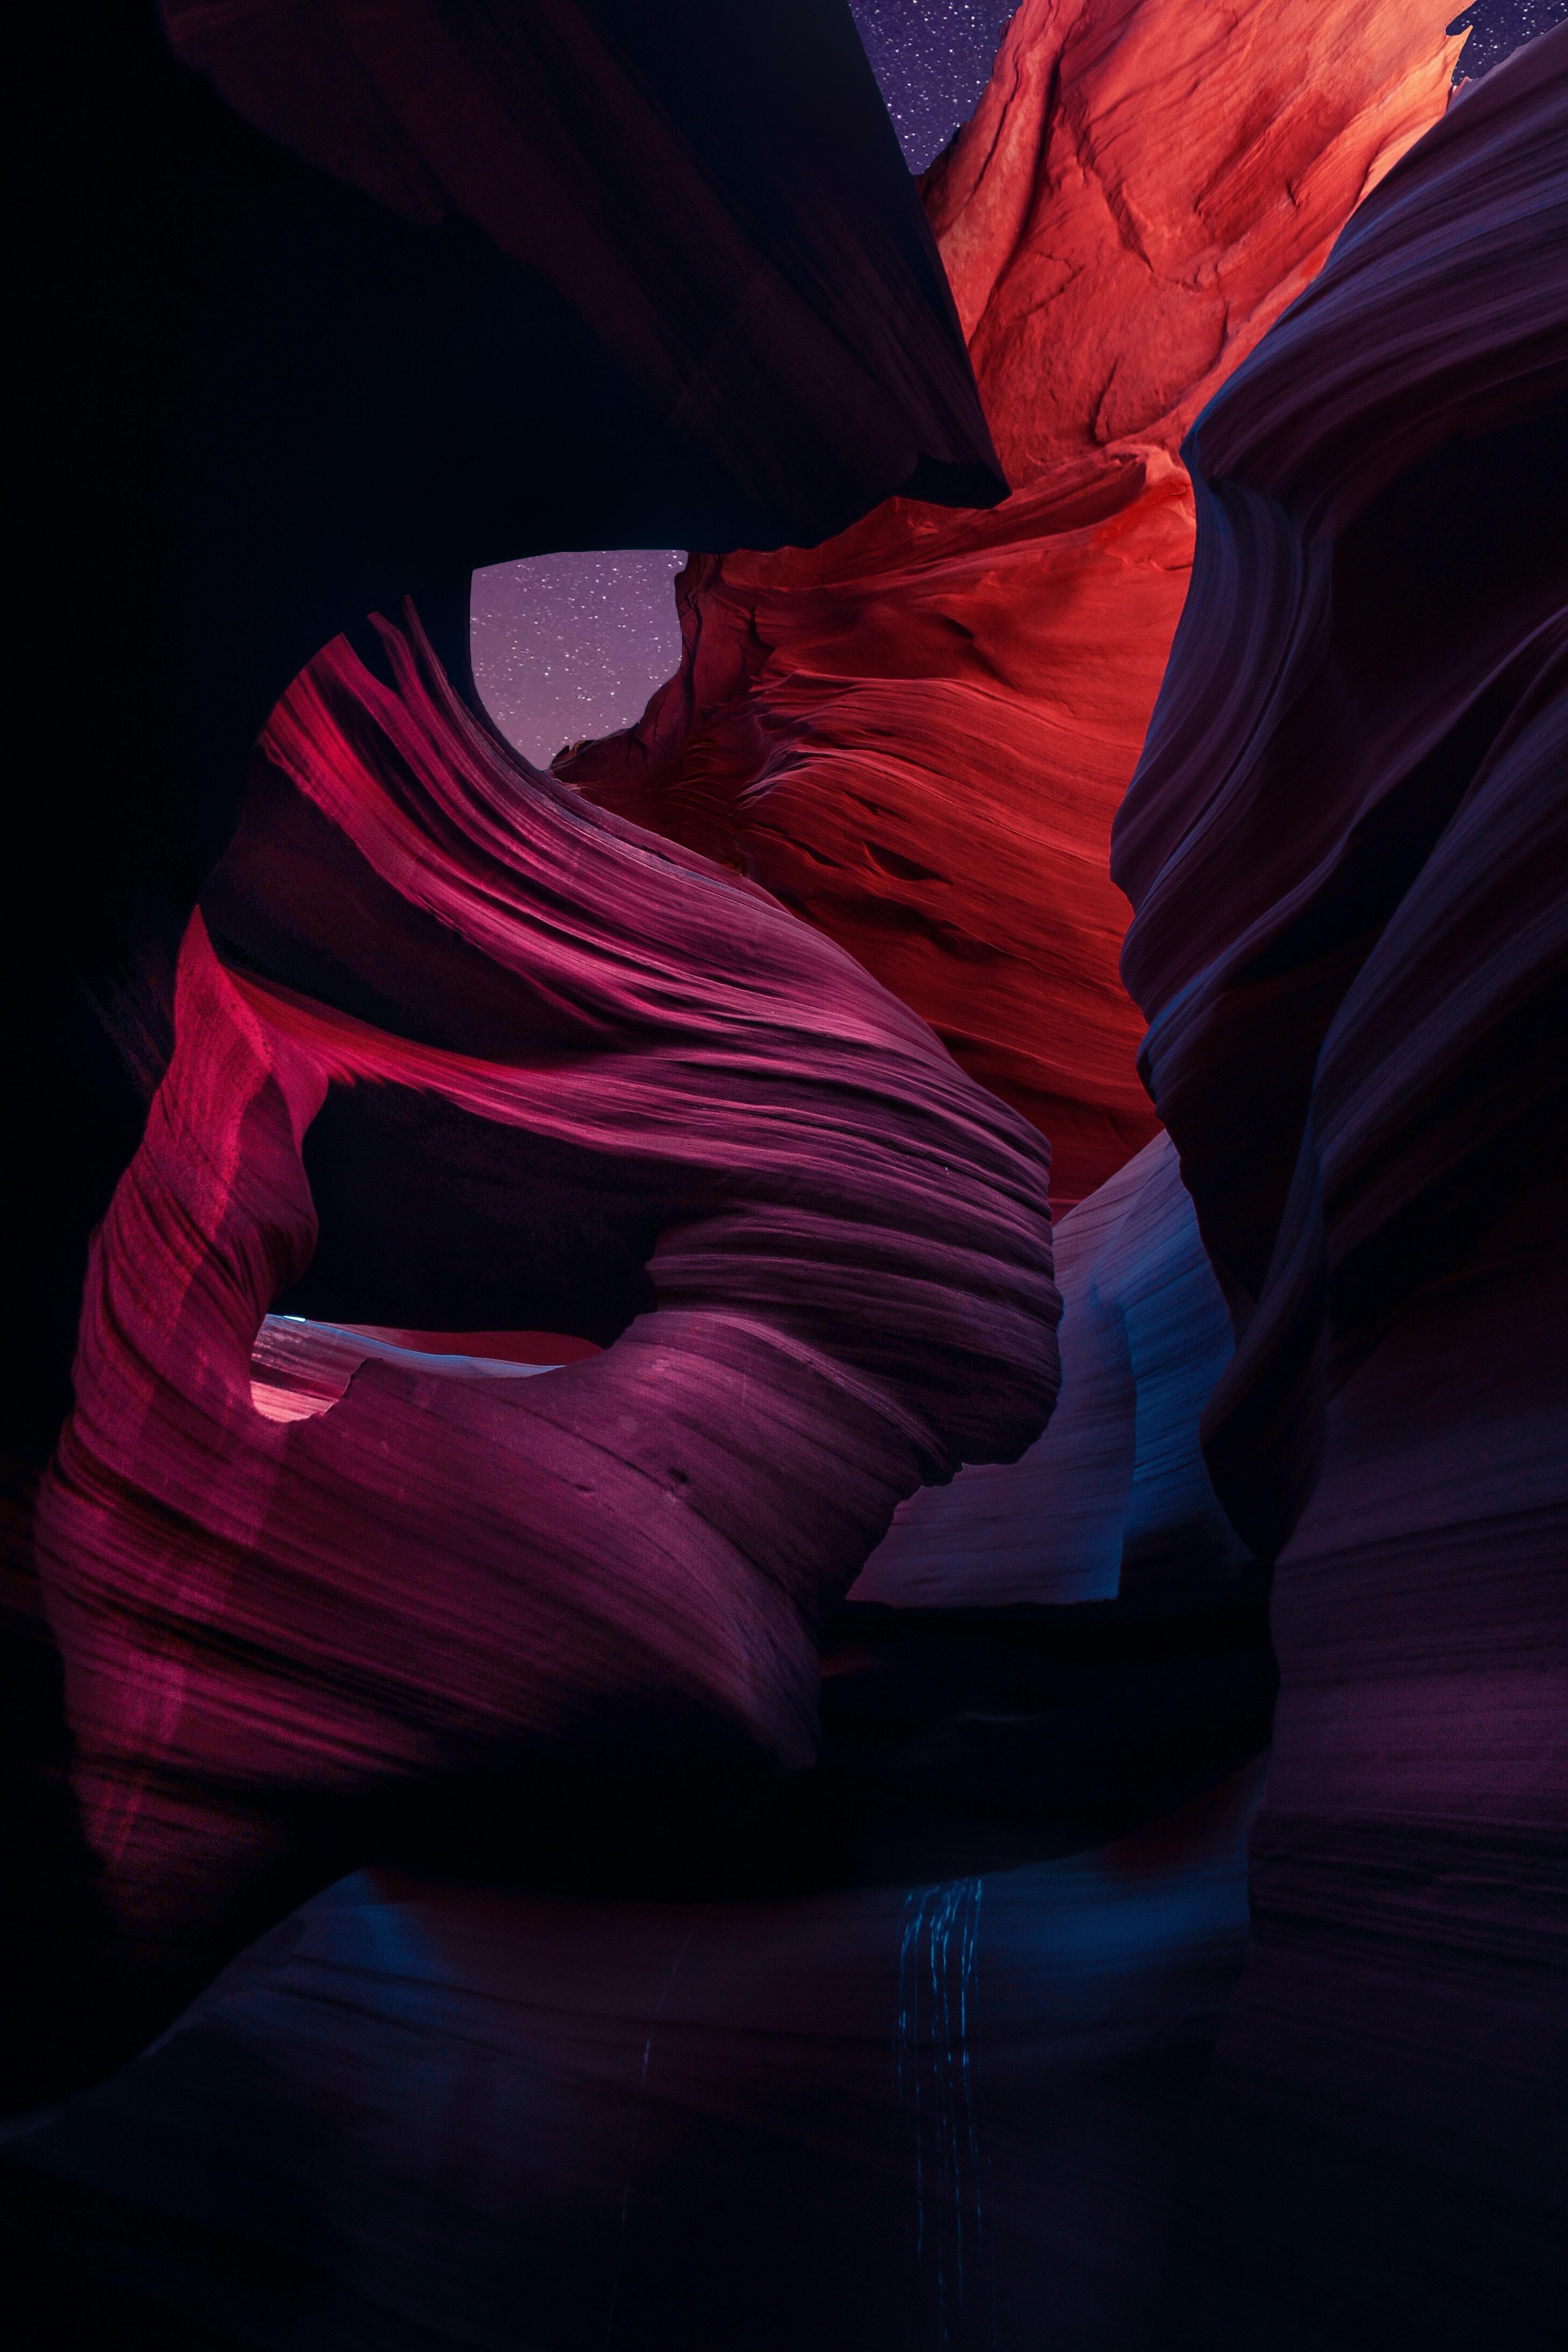 brown rock formation digital wallpaper